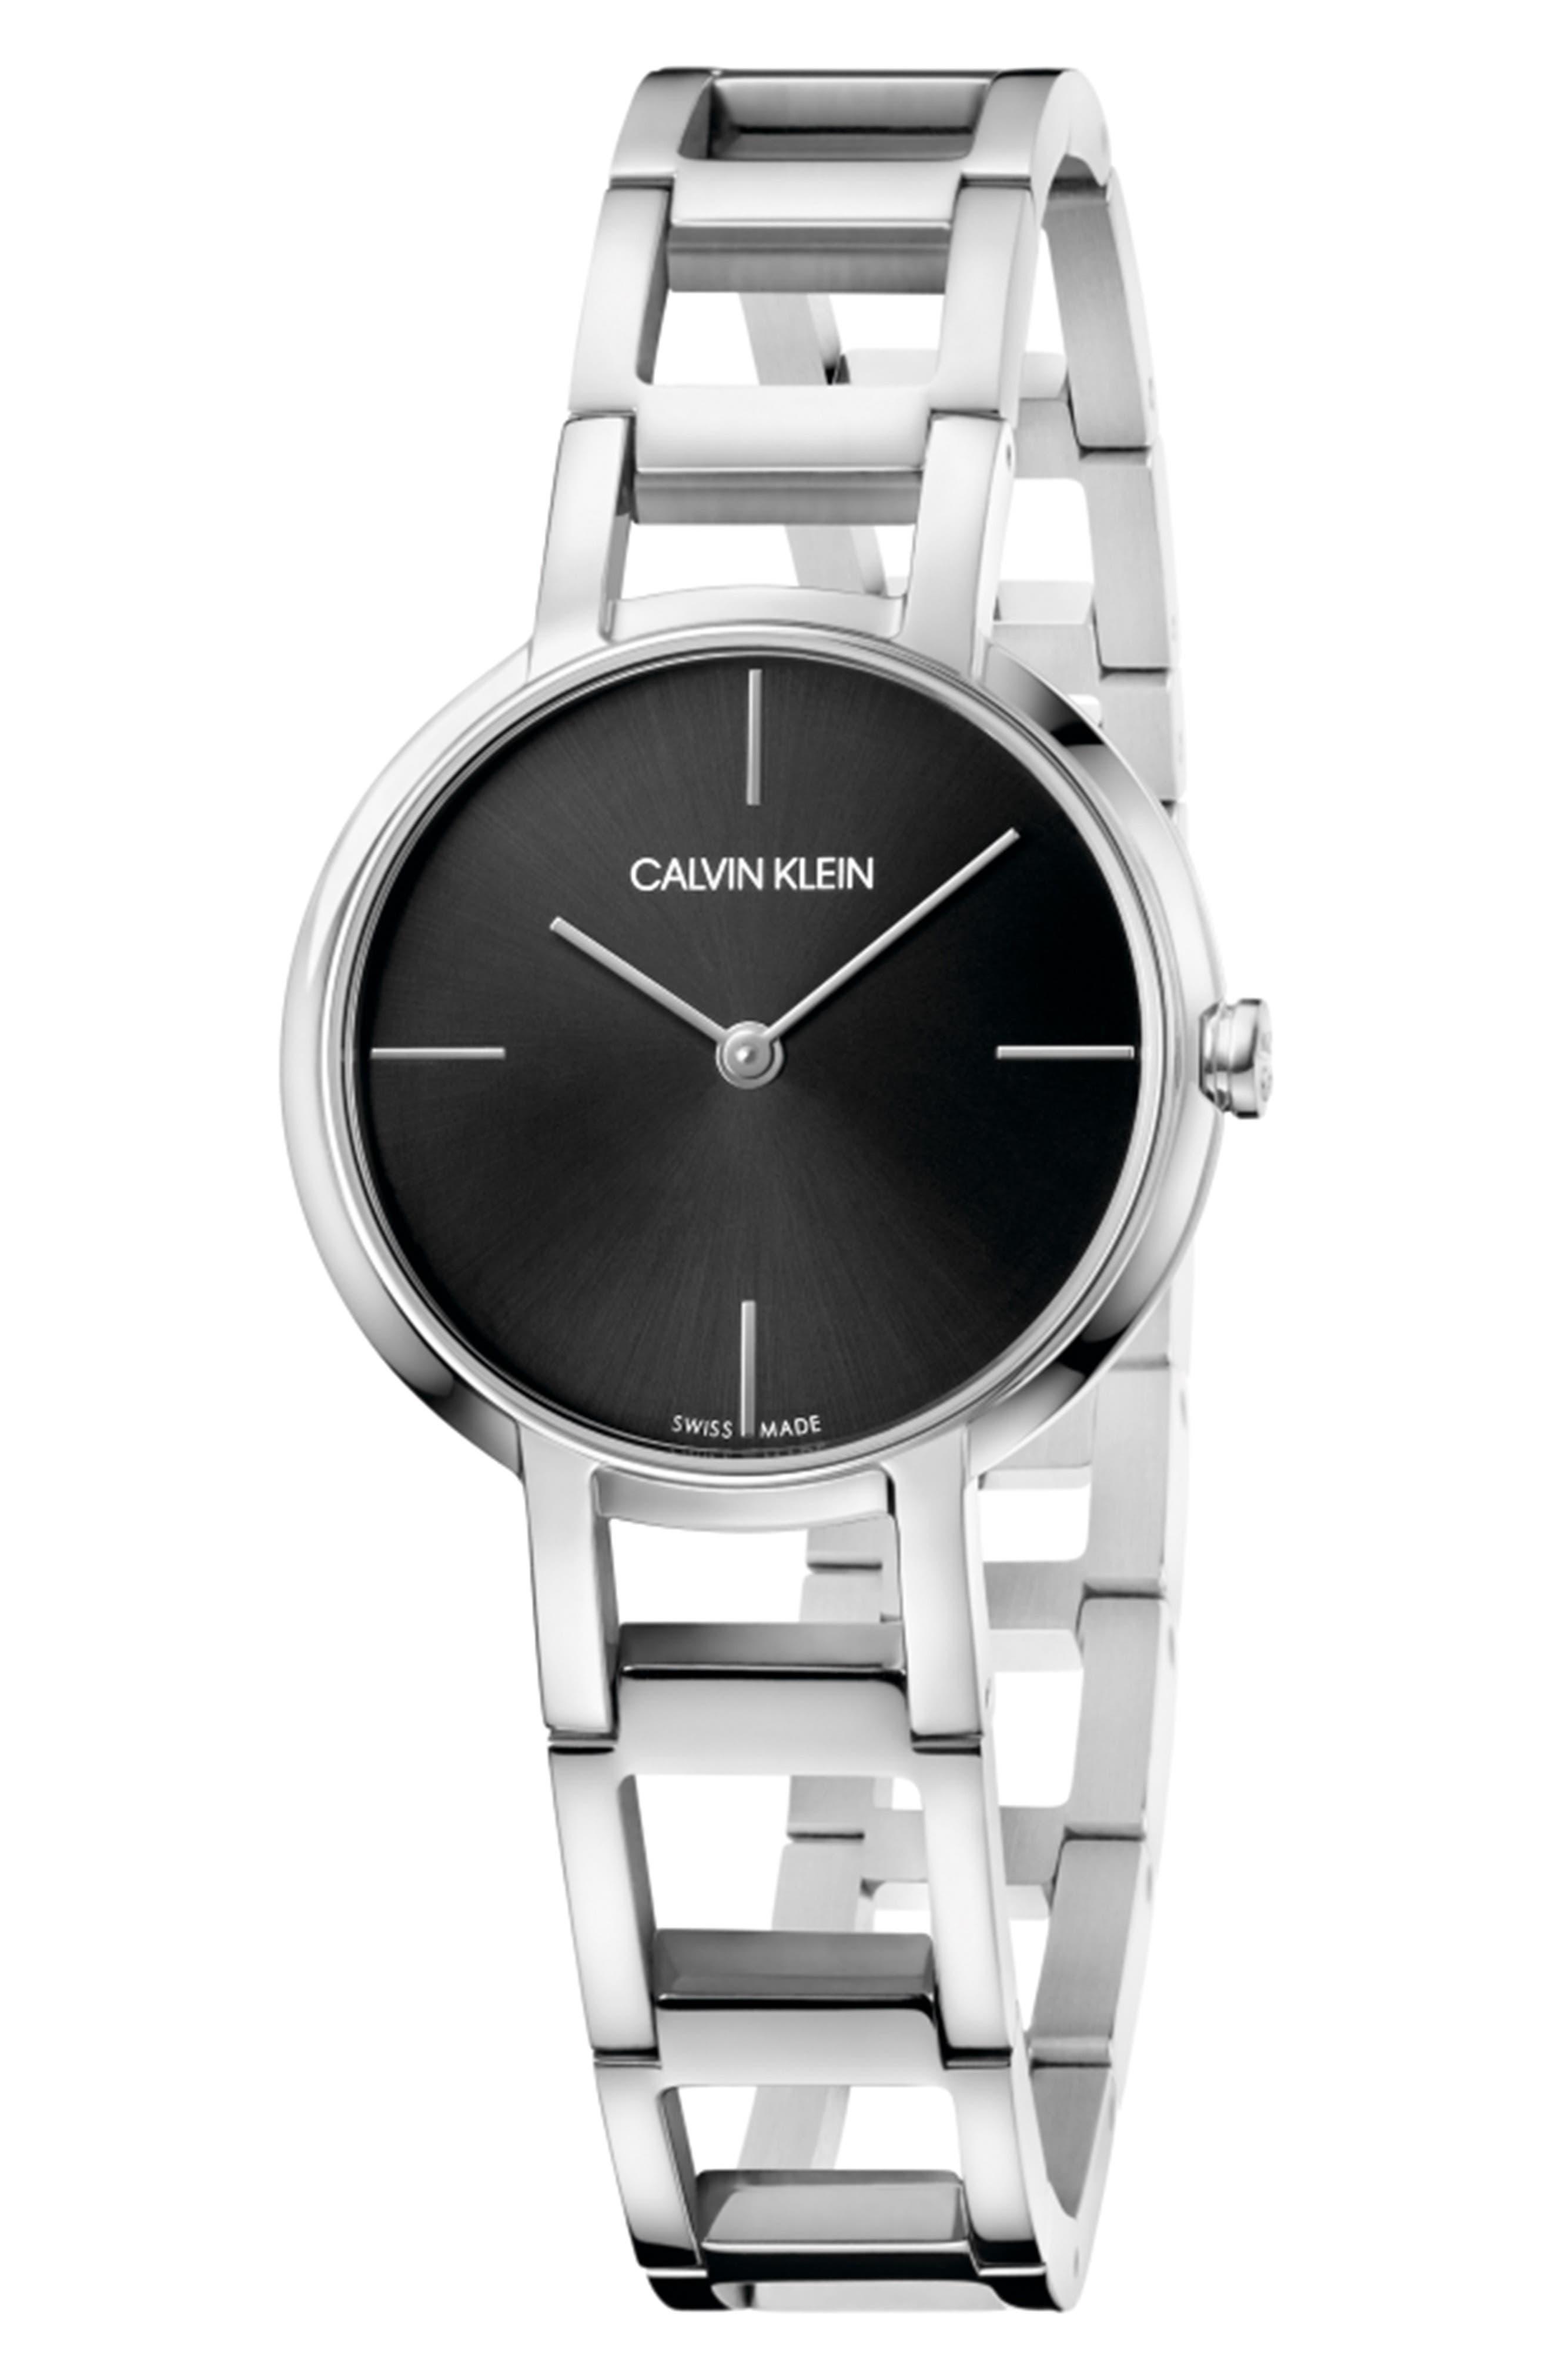 CALVIN KLEIN, Cheers Bracelet Watch, 32mm, Main thumbnail 1, color, SILVER/ BLACK/ SILVER